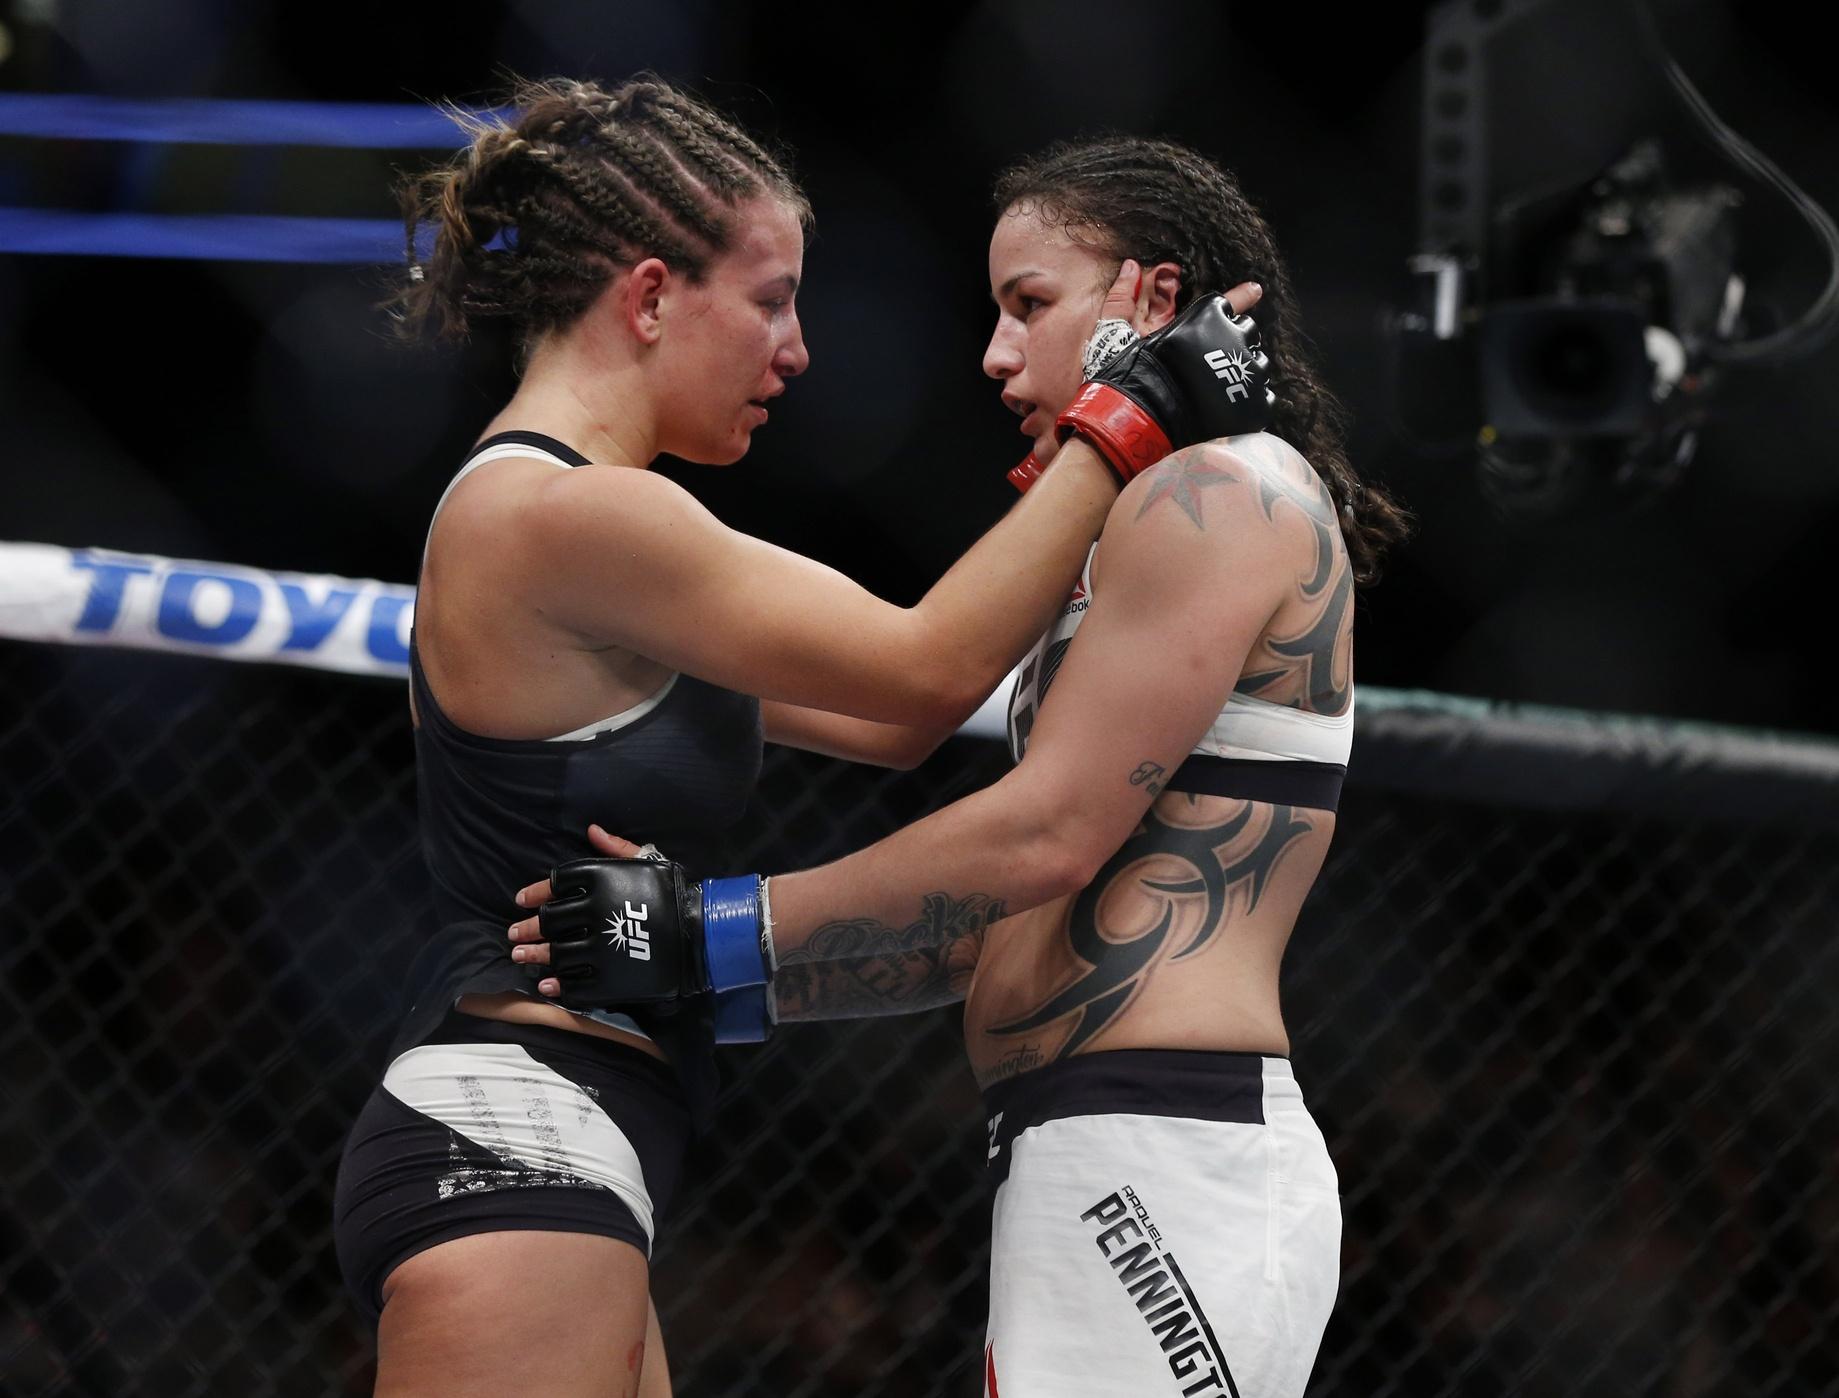 Miesha Tate Retires After Loss to Raquel Pennington at UFC 205